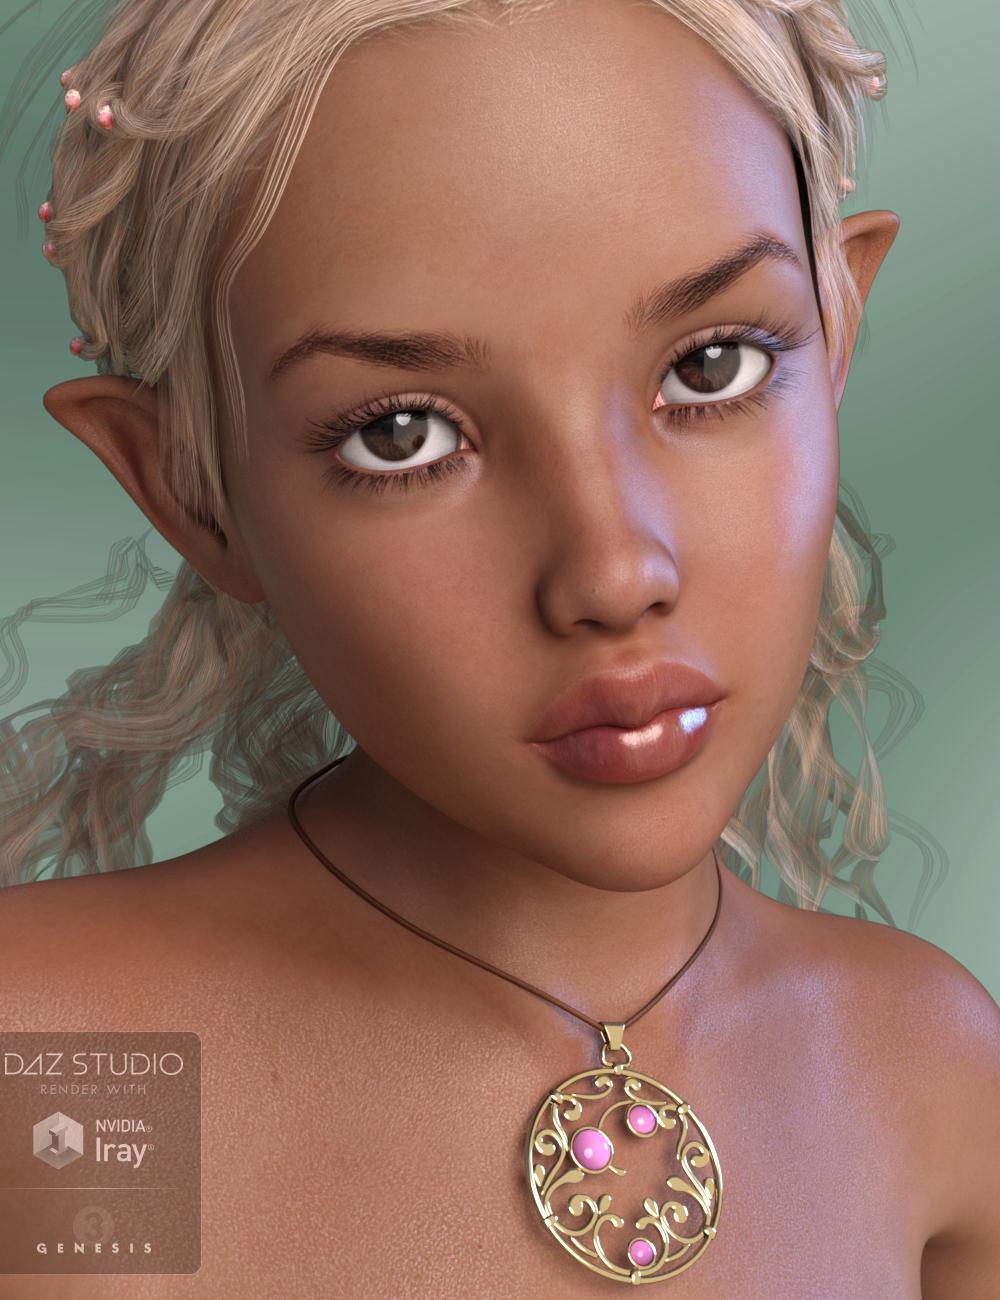 P3D Caro by: P3Design, 3D Models by Daz 3D